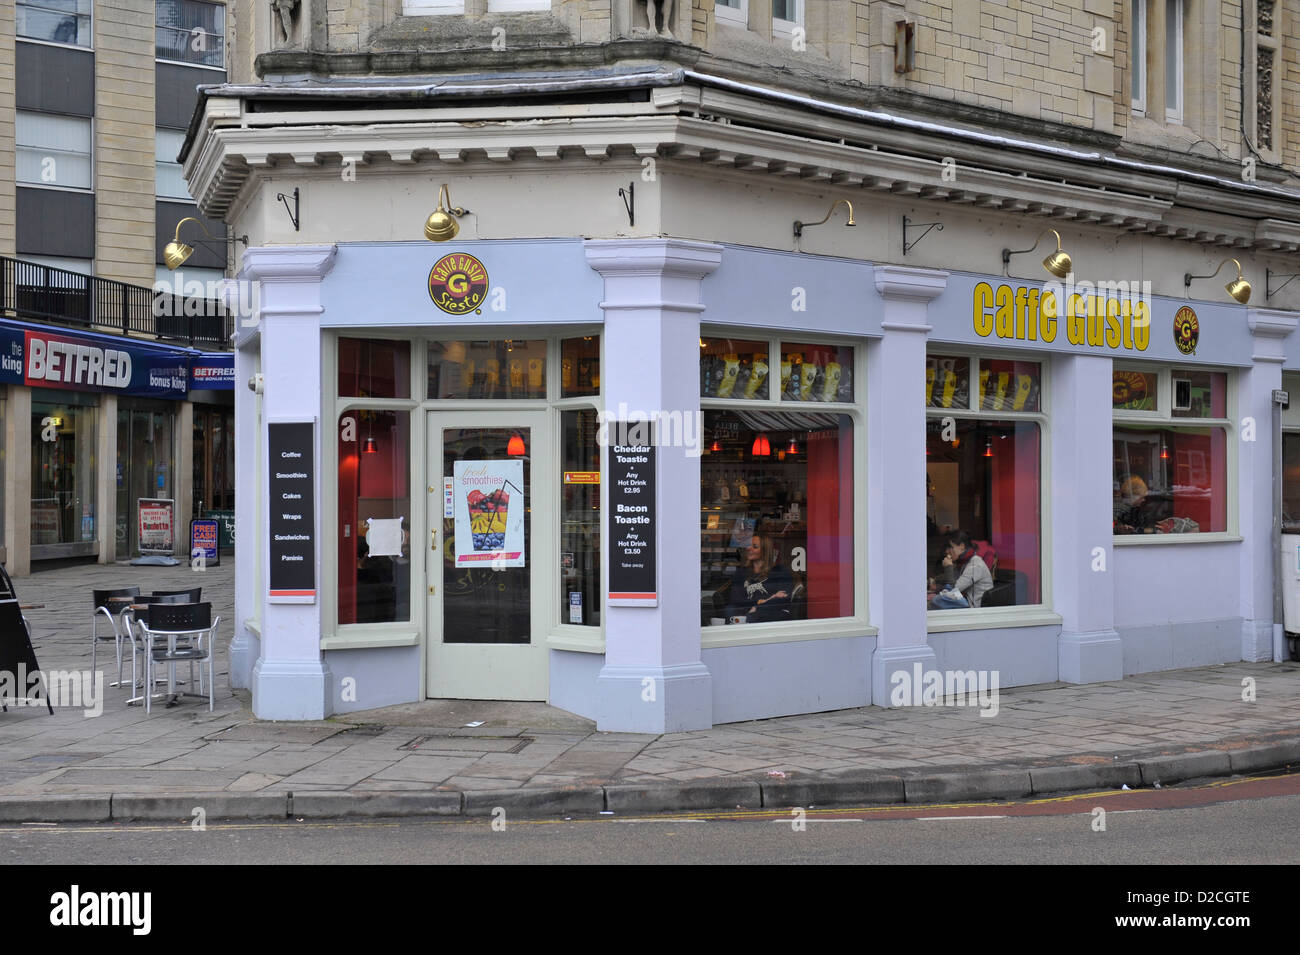 Caffee Gusto Ladengeschäft oder Gerät in UK street Stockbild